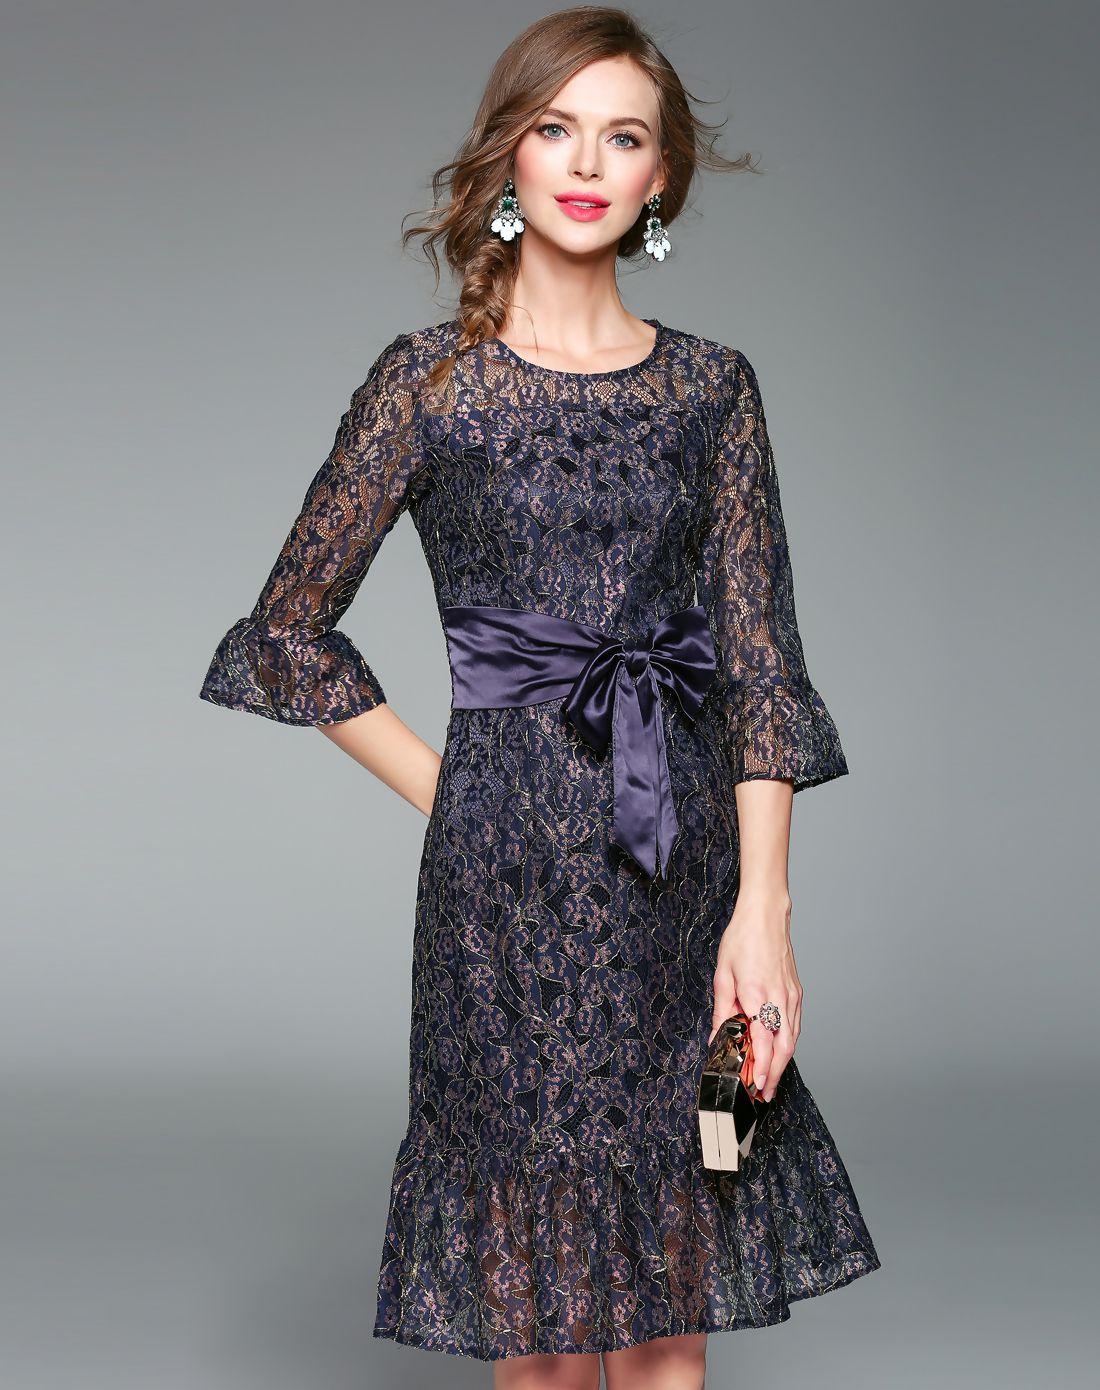 Adorewe vipme skater dressesdesigner zeraco purple lace bell